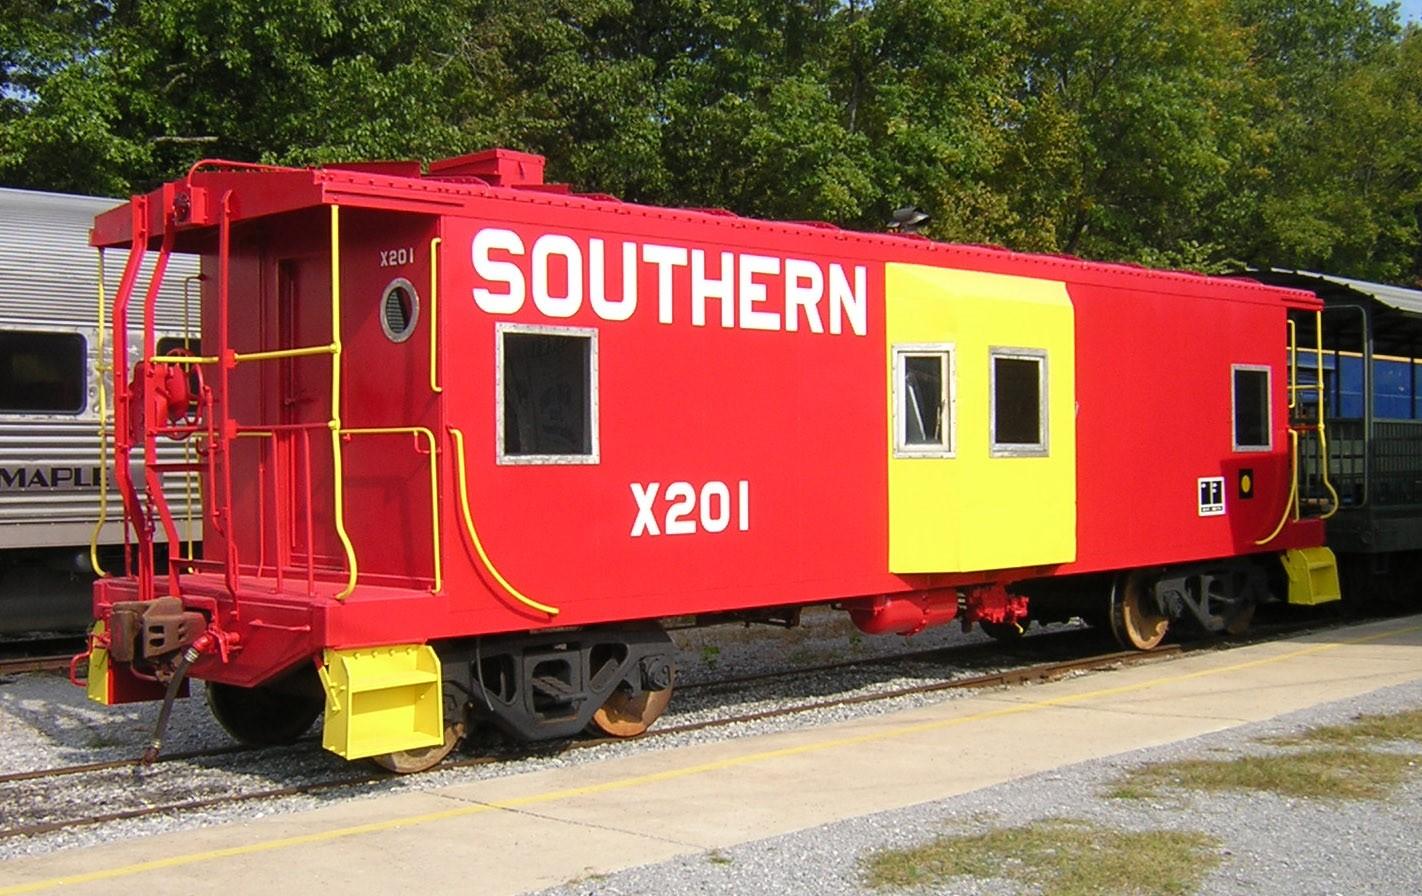 Southern Railway caboose X201